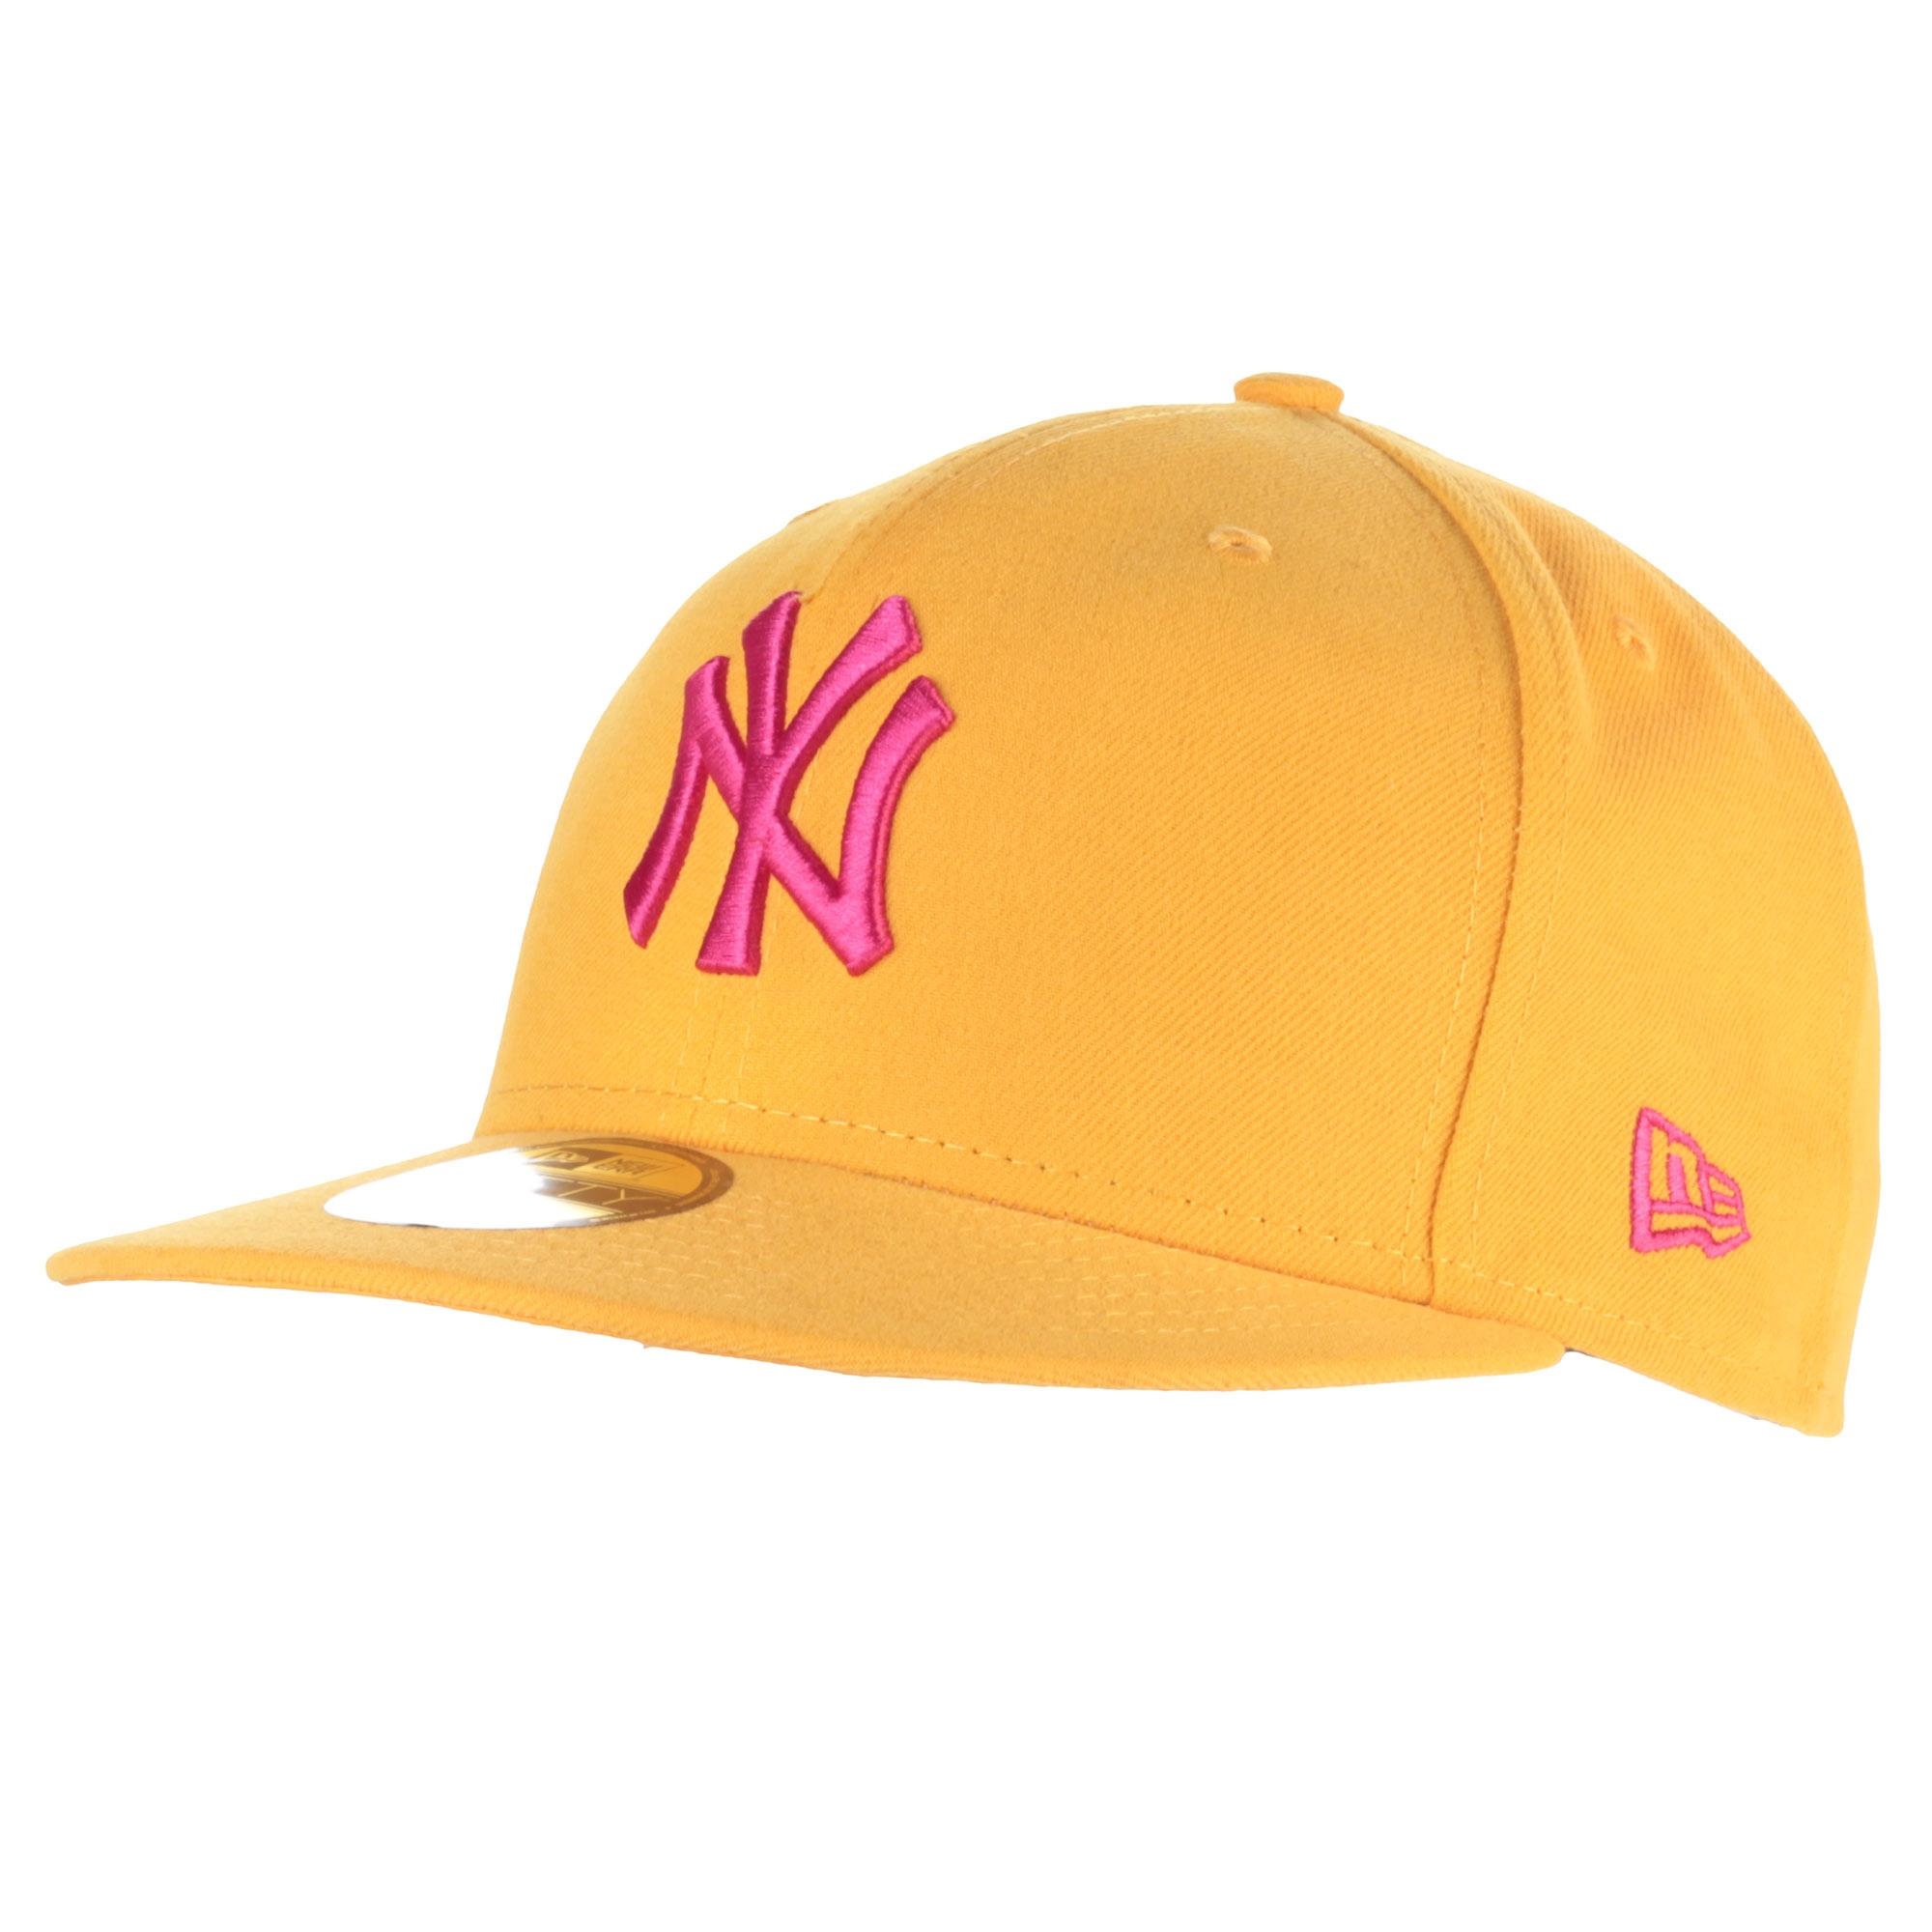 Kšiltovka New Era New York Yankees 59Fifty gld/rse